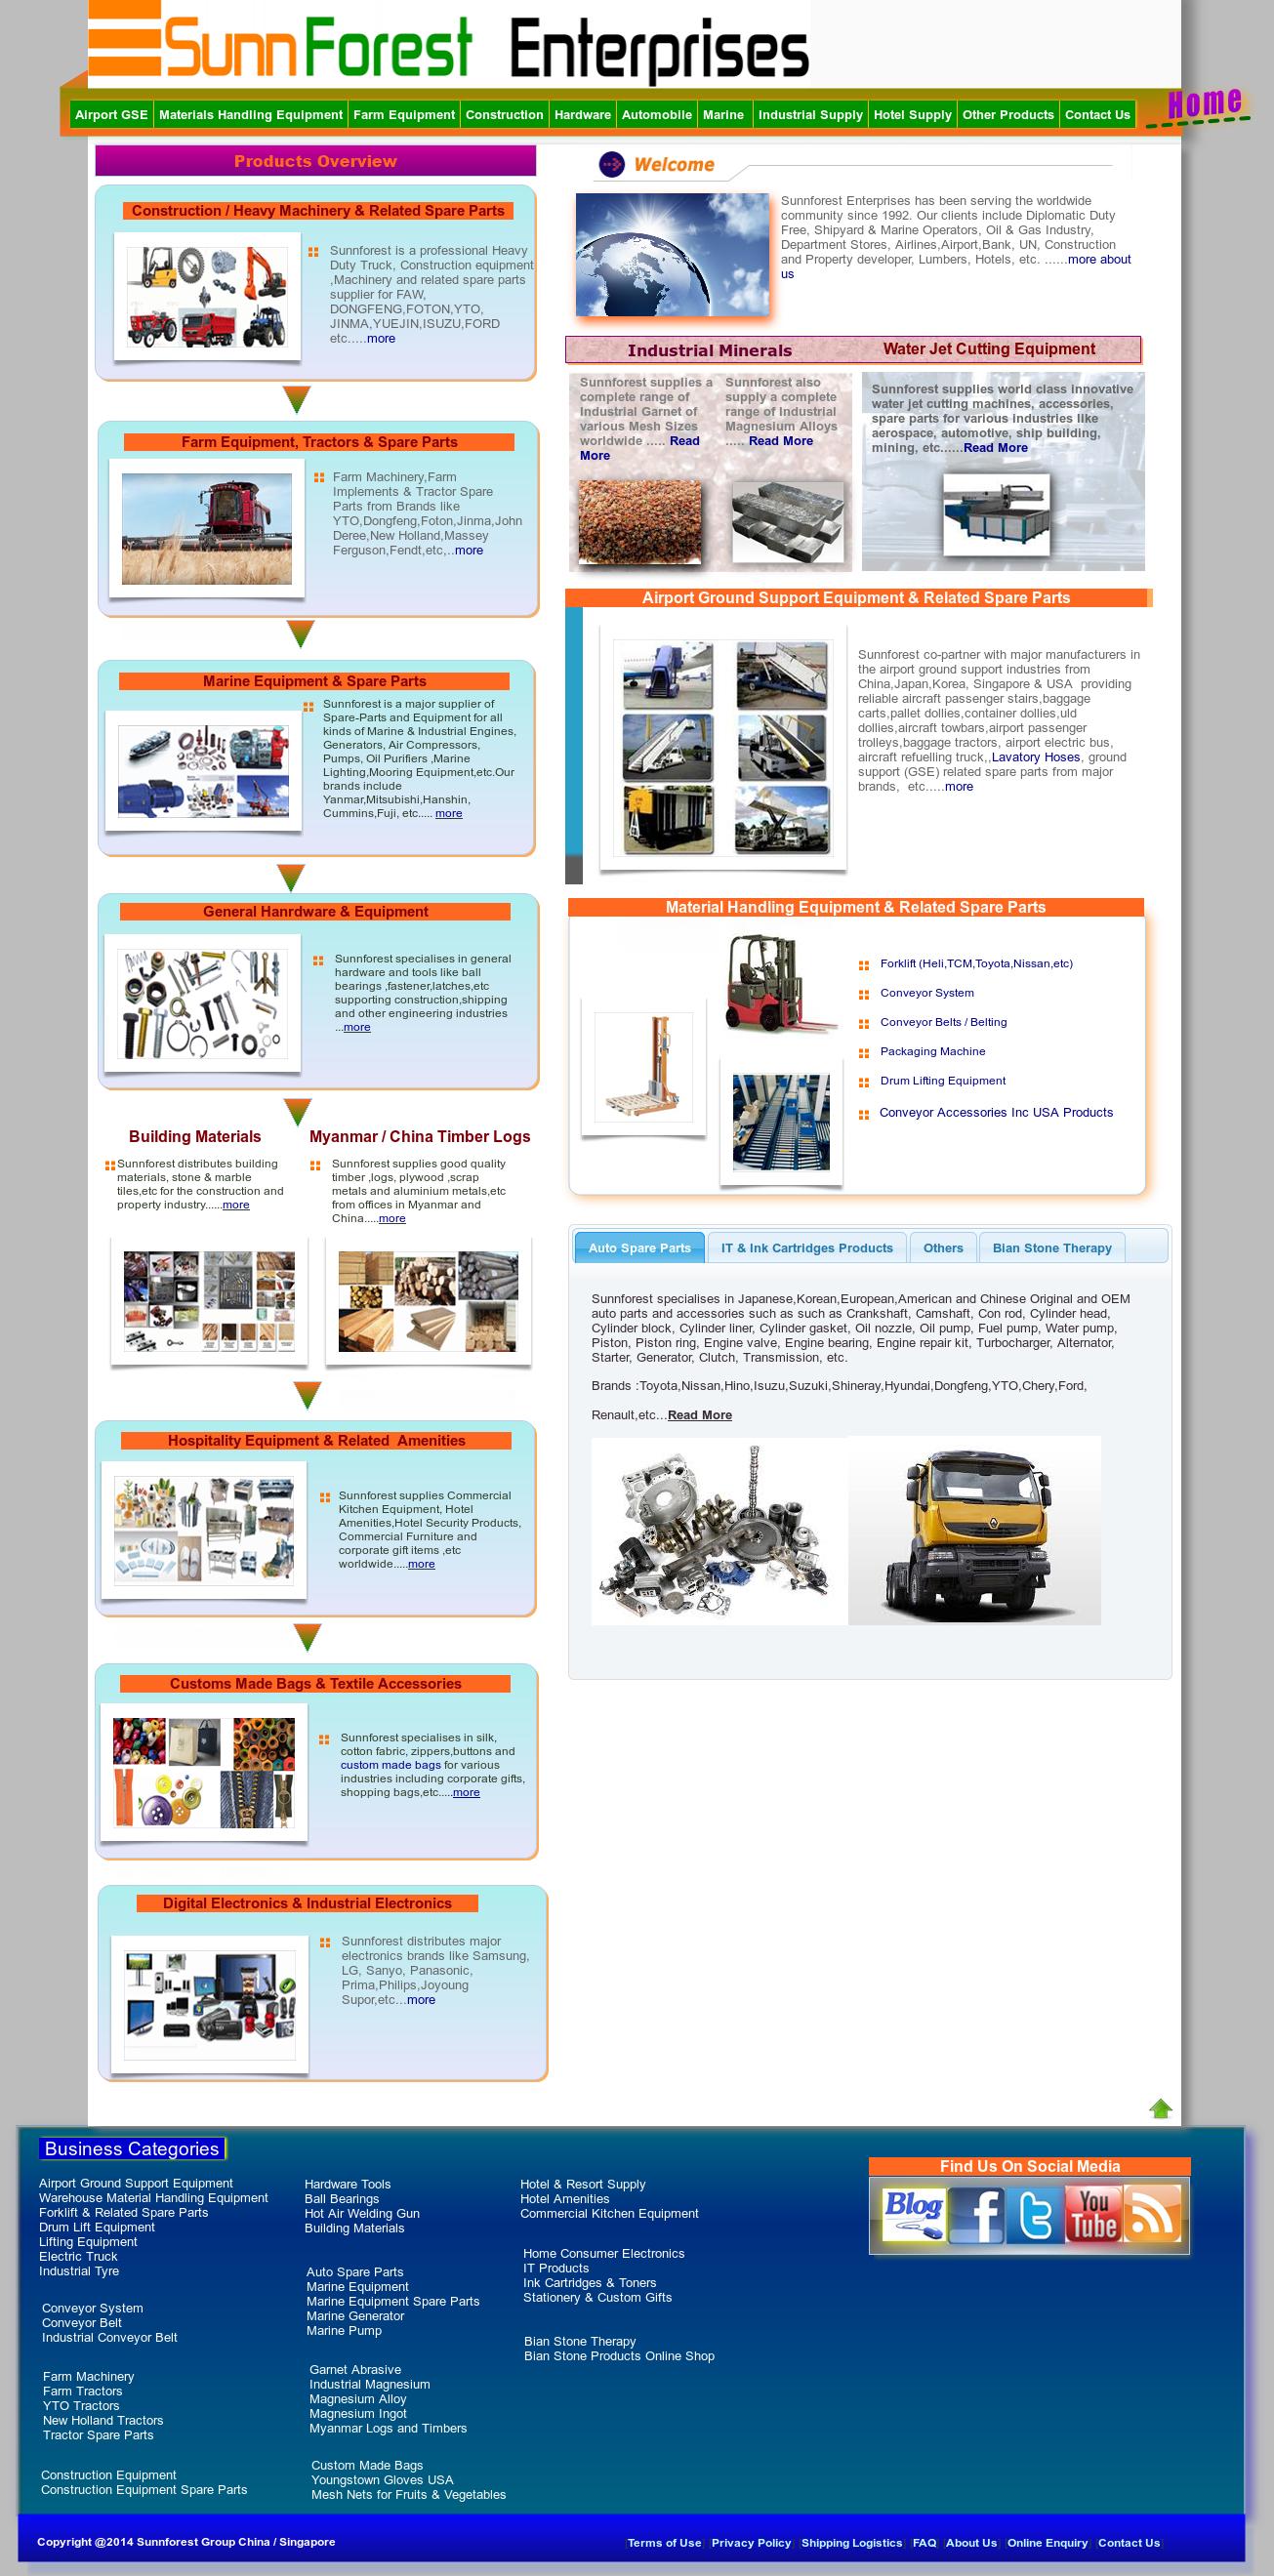 Sunnforest Enterprises Competitors, Revenue and Employees